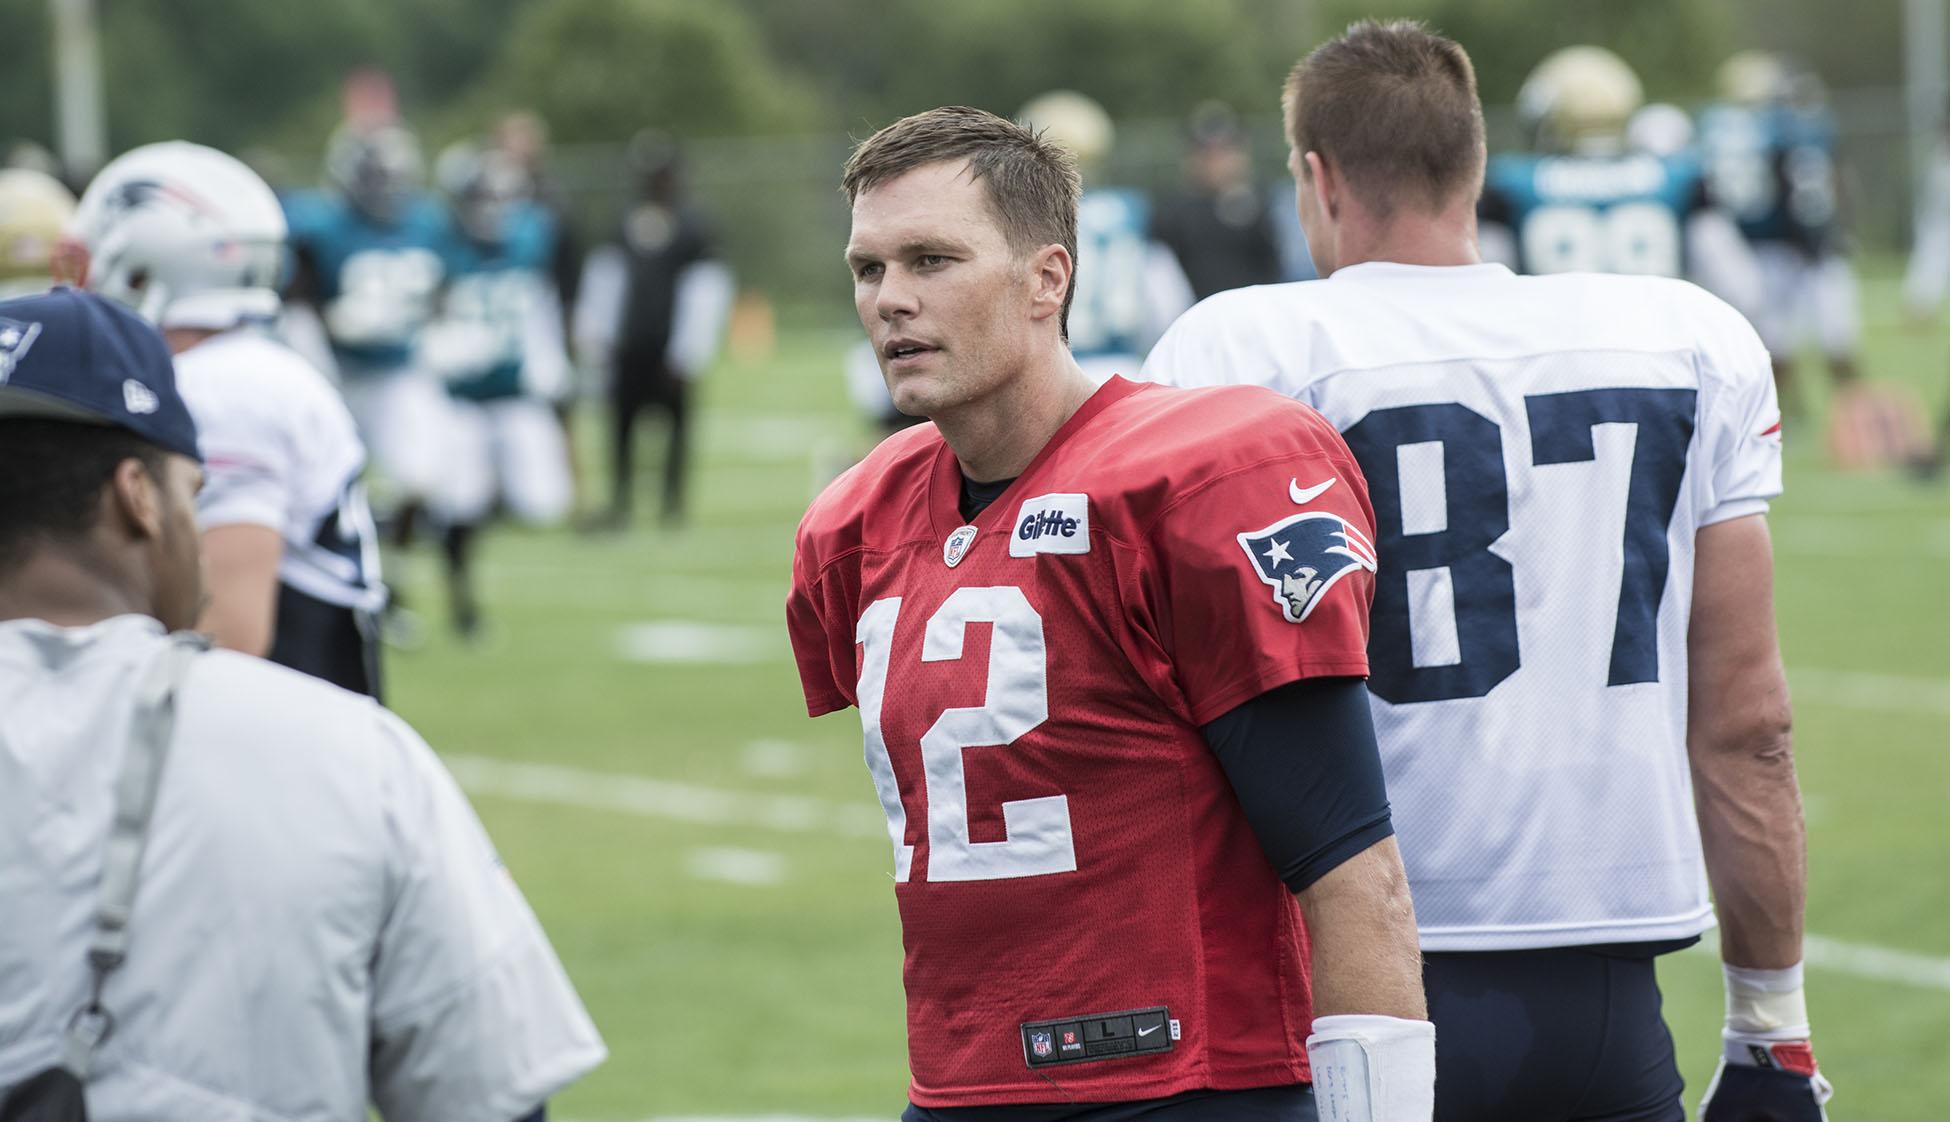 Tom Brady Patriots training camp, August 7, 2017